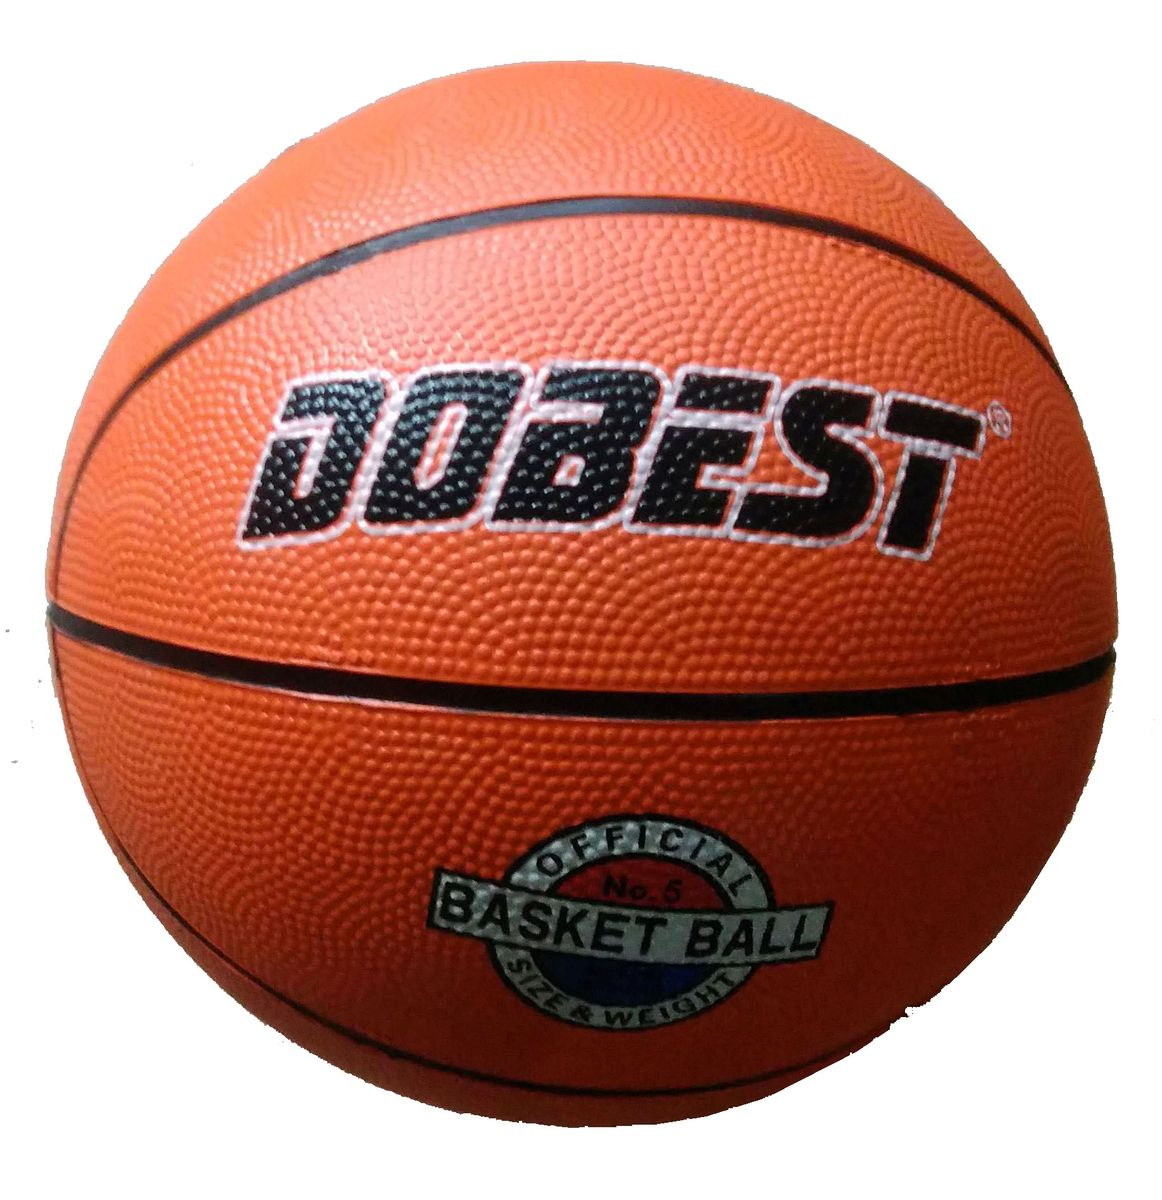 "Мяч баскетбольный Dobest ""RB5"", цвет: оранжевый. Размер 5"